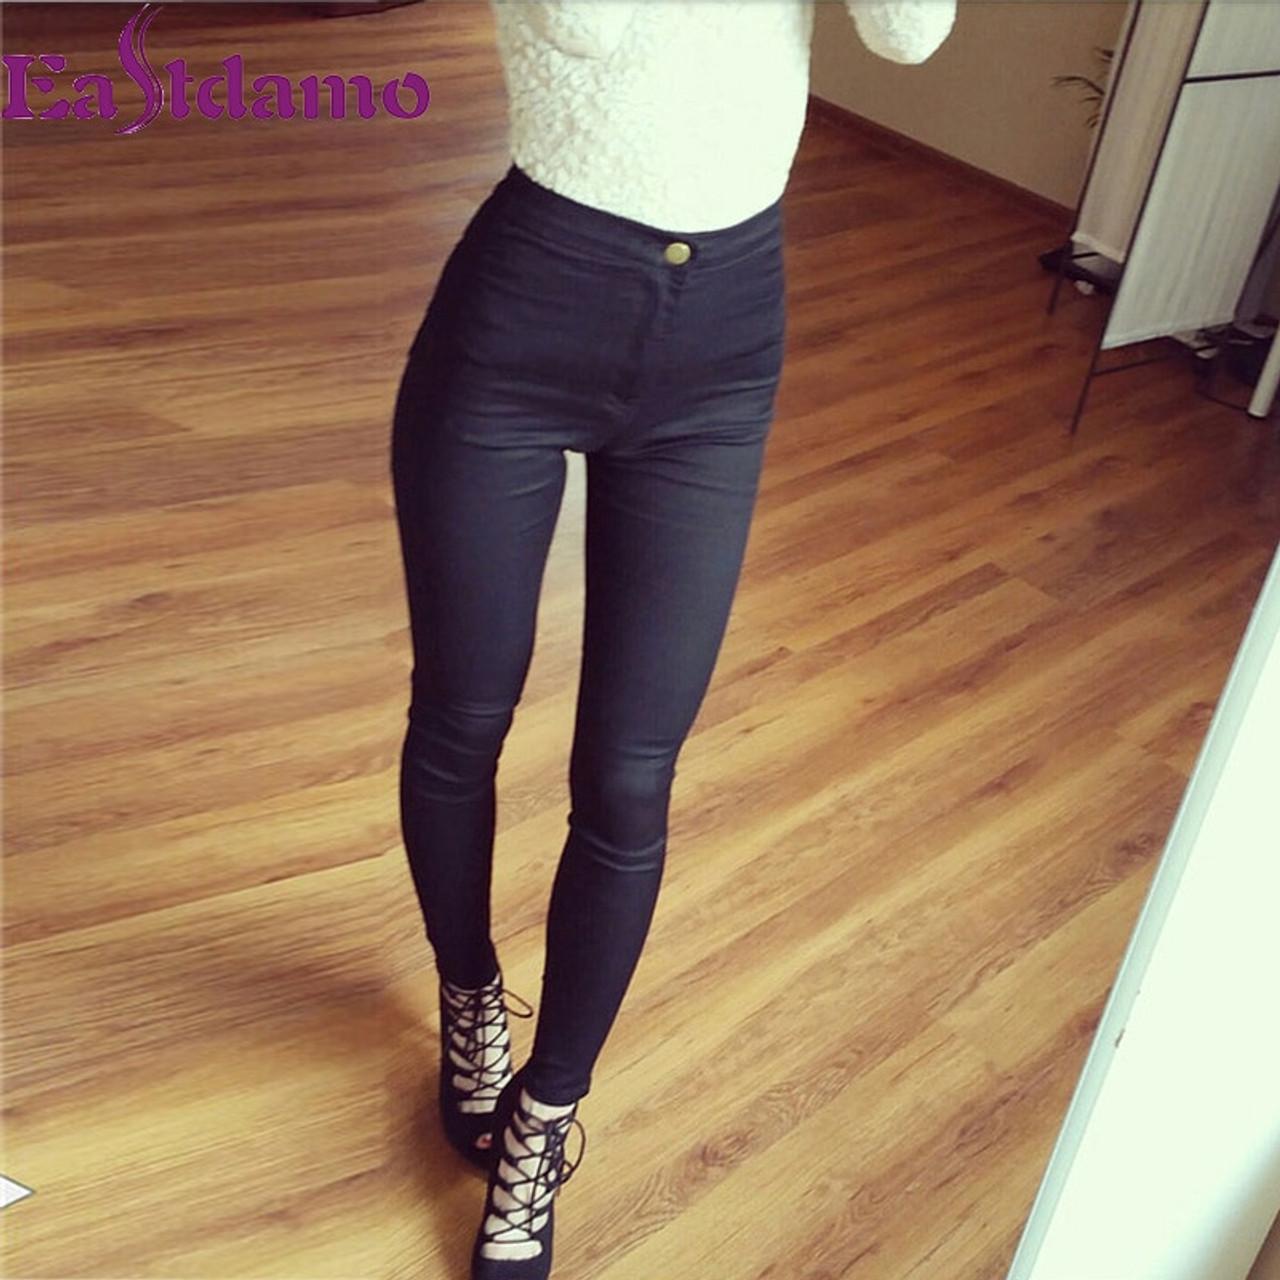 791c6326790 ... Eastdamo Slim Jeans For Women Skinny High Waist Jeans Woman Blue Denim  Pencil Pants Stretch Waist ...